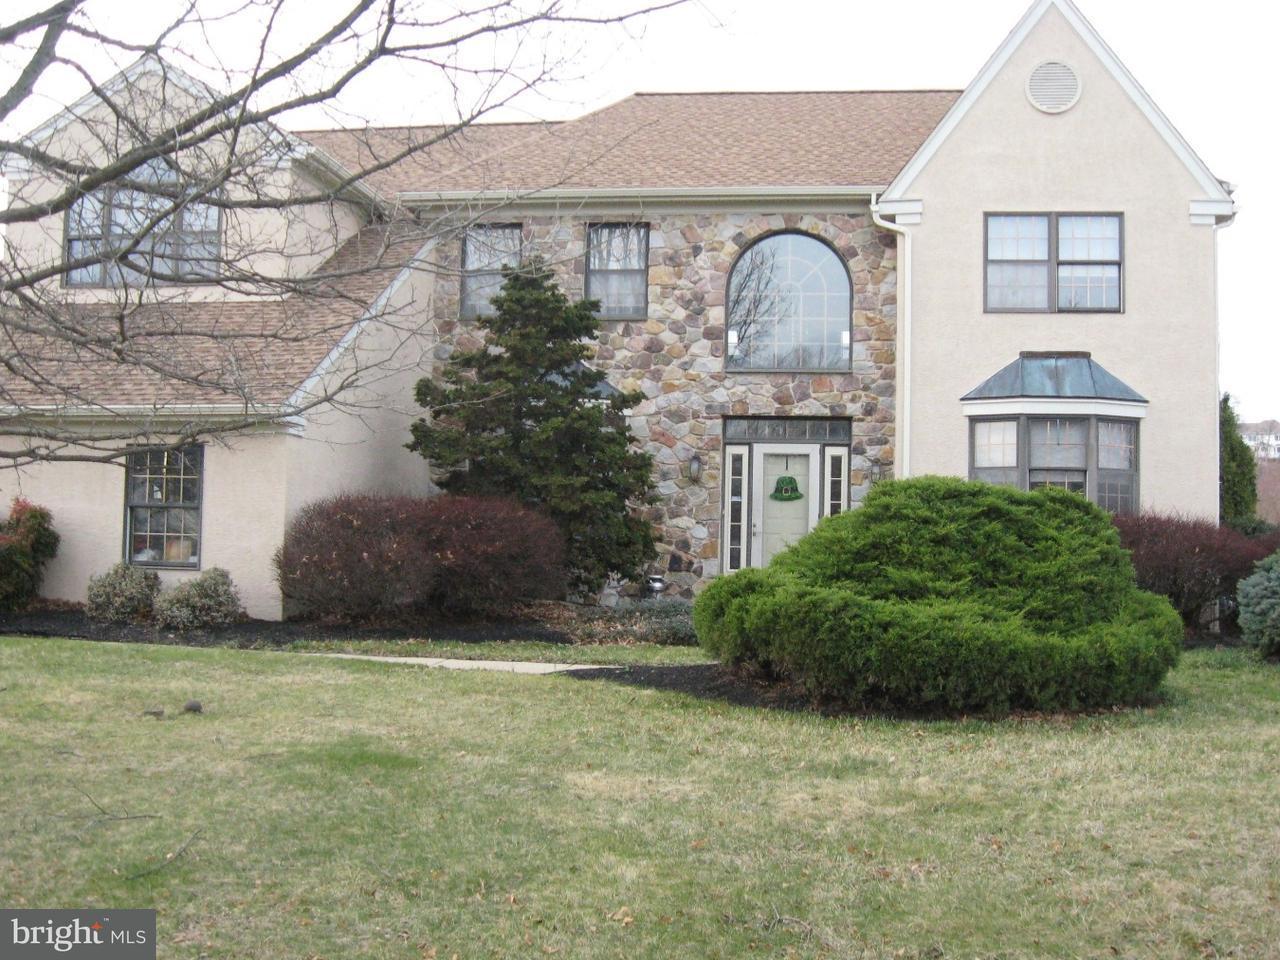 Single Family Home for Sale at 1030 SKYLINE Circle Audubon, Pennsylvania 19403 United States